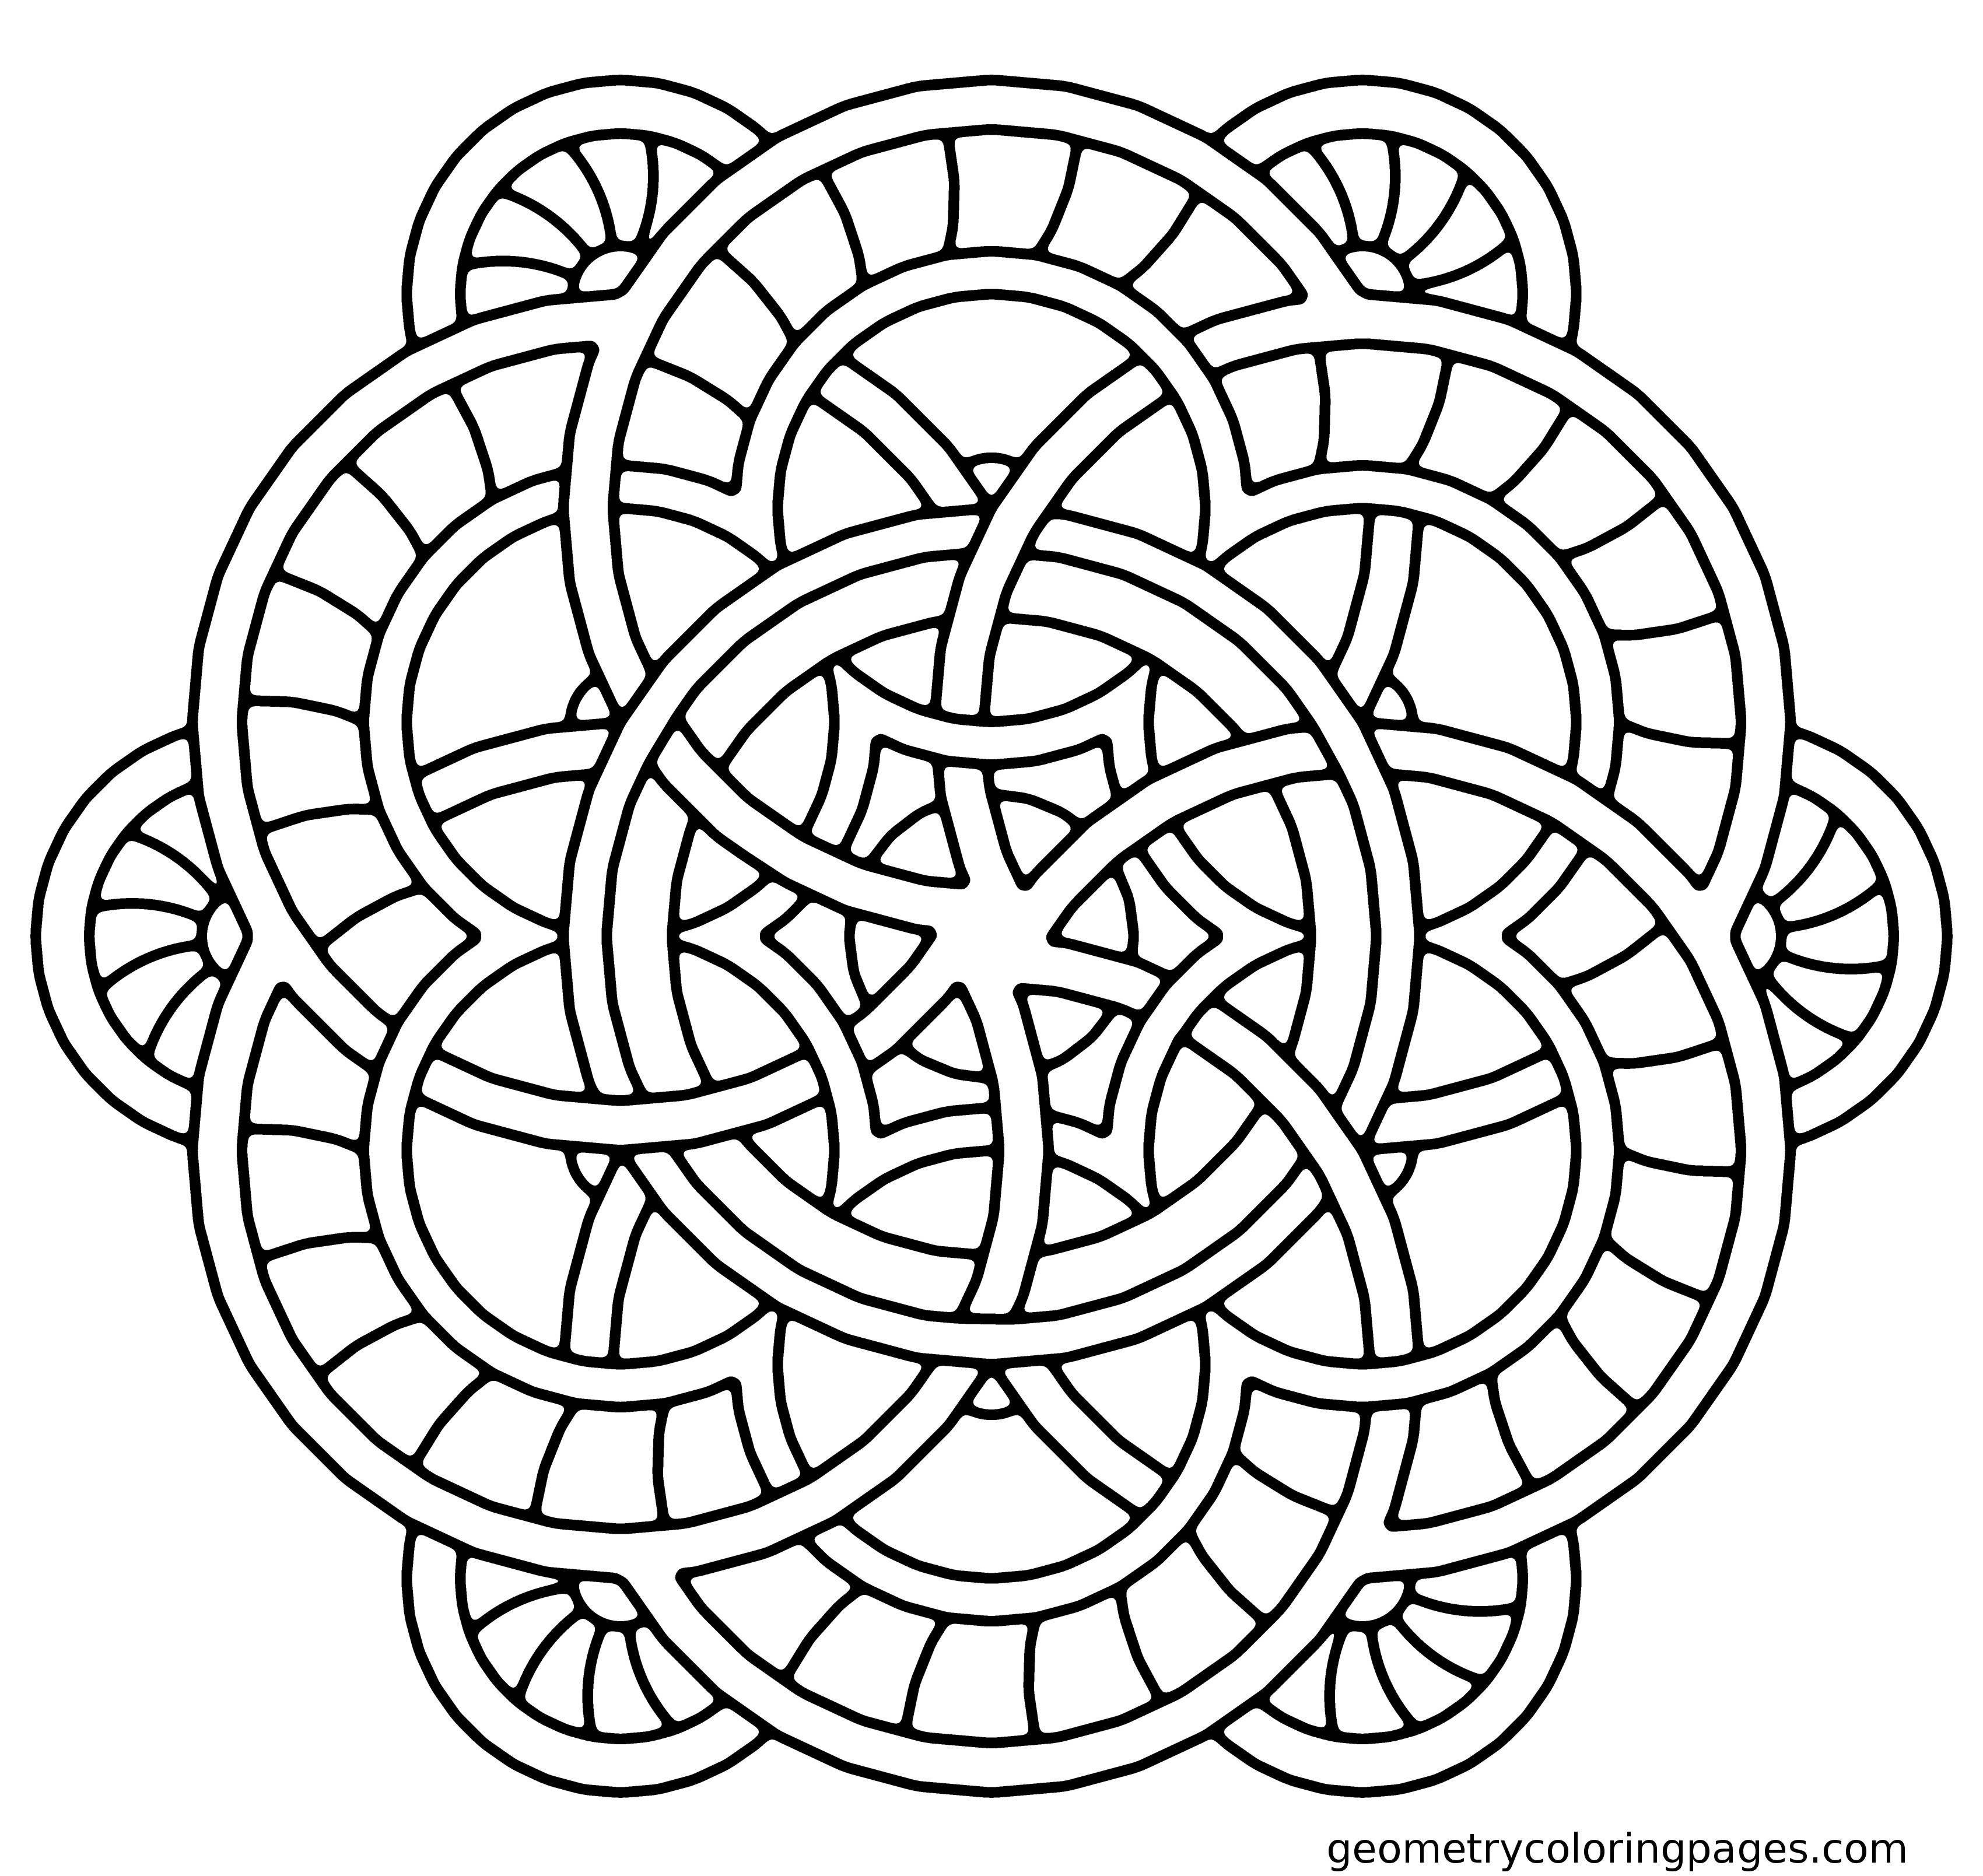 √ Coloring Pages: Mandala Coloring Pages And Book - Free Printable Mandalas Pdf